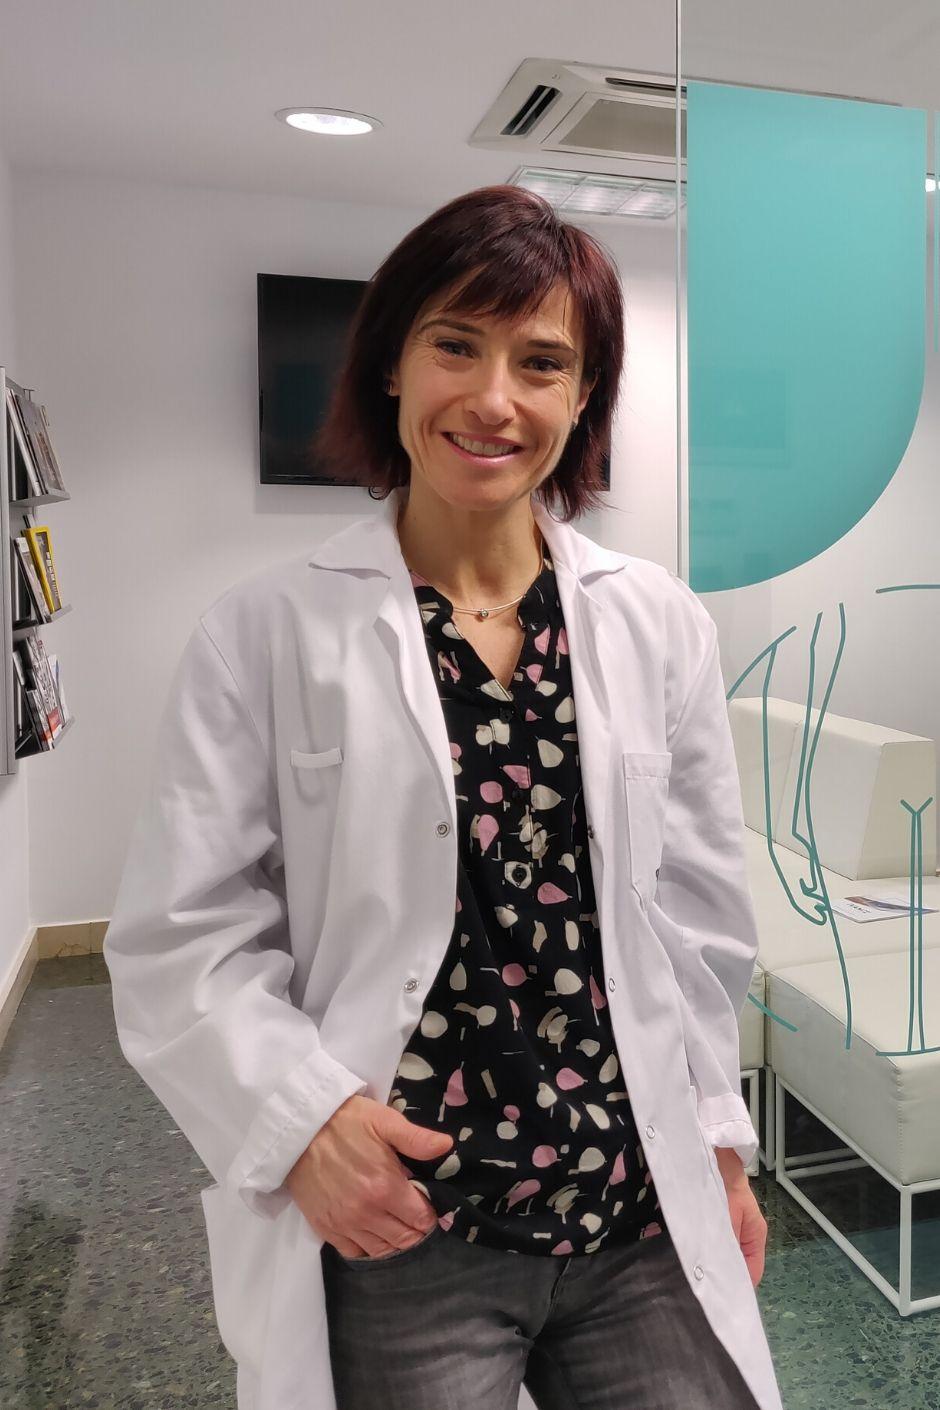 Saioa Audikana IVANCE Cirugía estética en Donostia